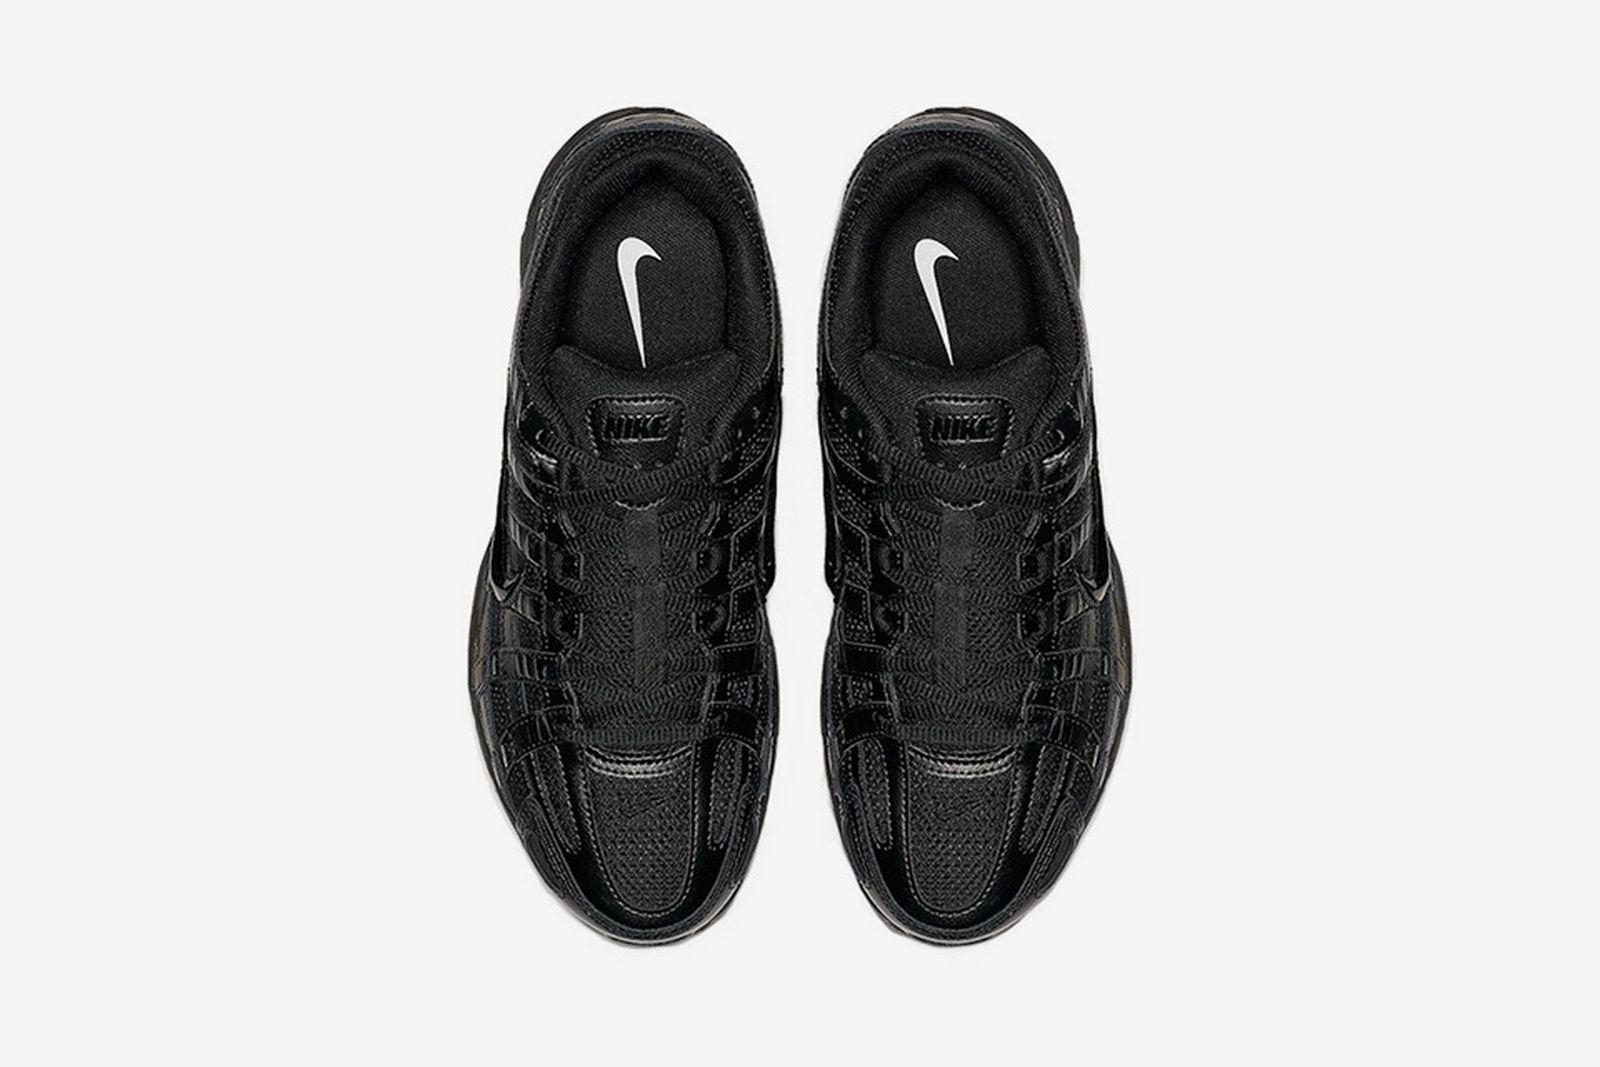 nike p6000 cnpt release date details Nike P-6000 CNPT nike running